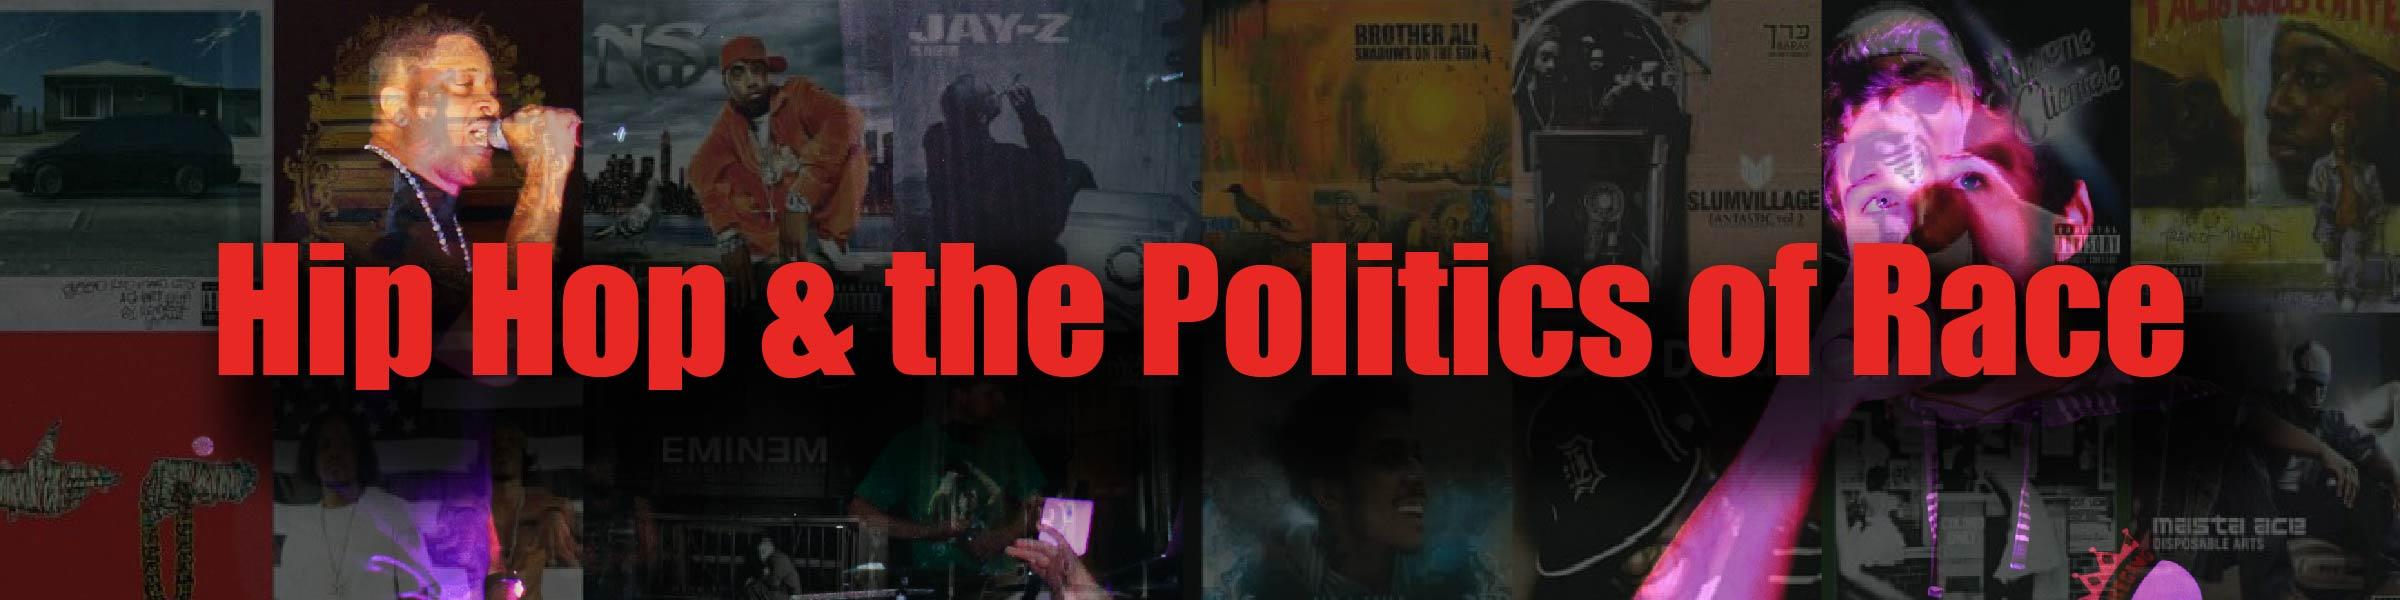 Hip Hop and Politics of Race